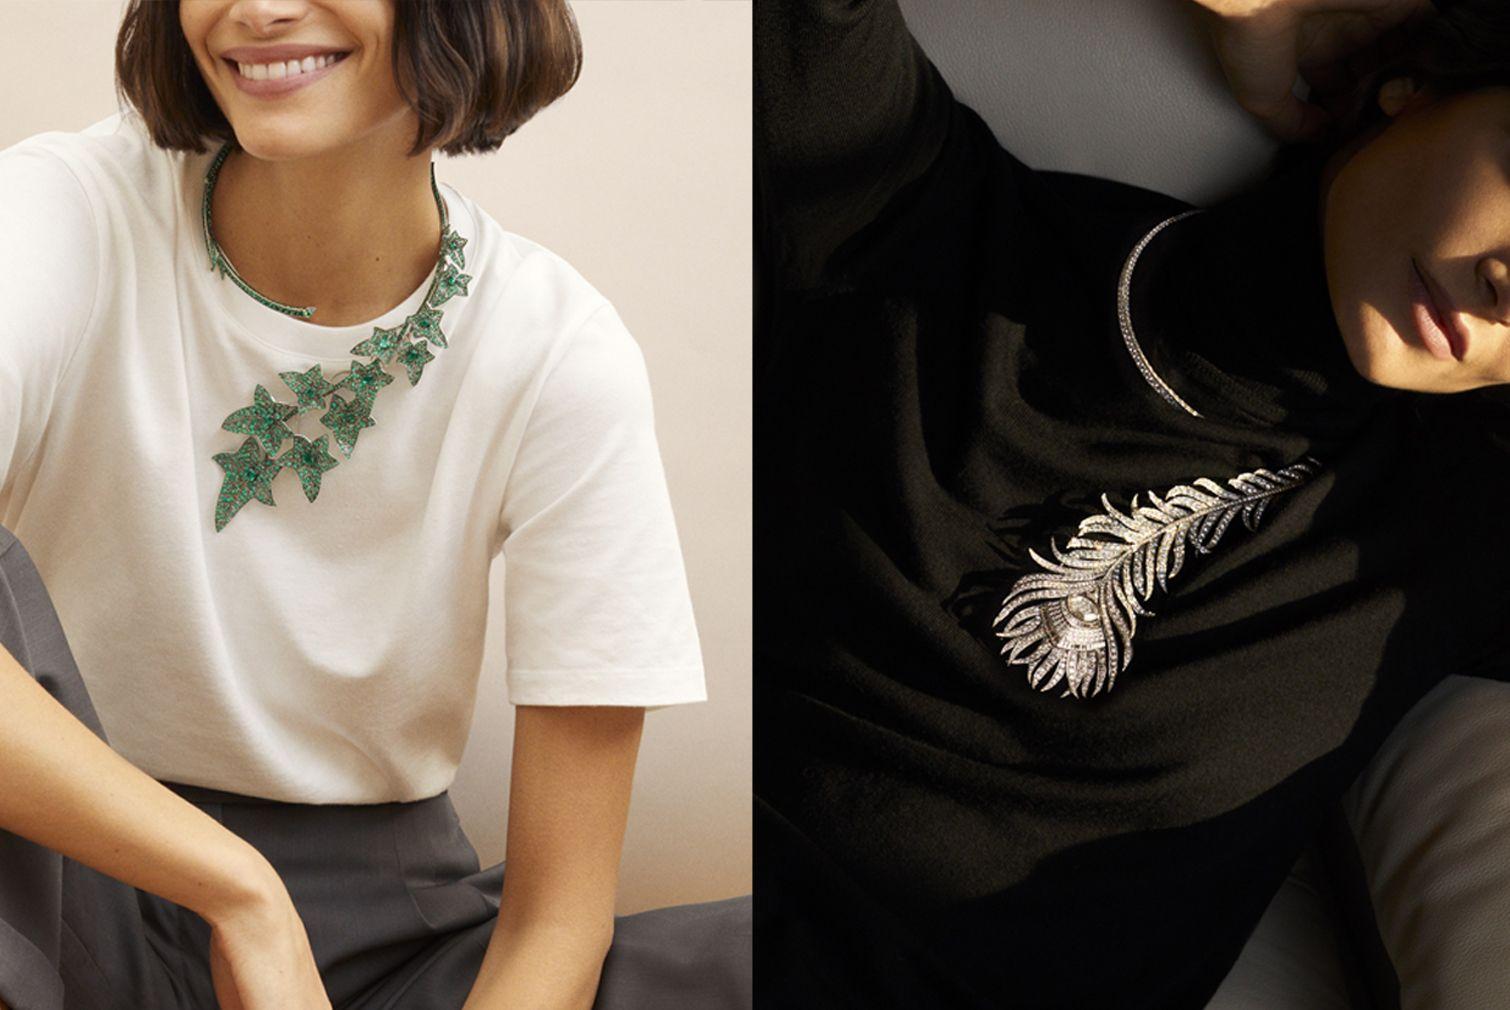 Boucheron寶詩龍標誌性高級珠寶系列再添力作:全新「問號項鍊」耀目問世